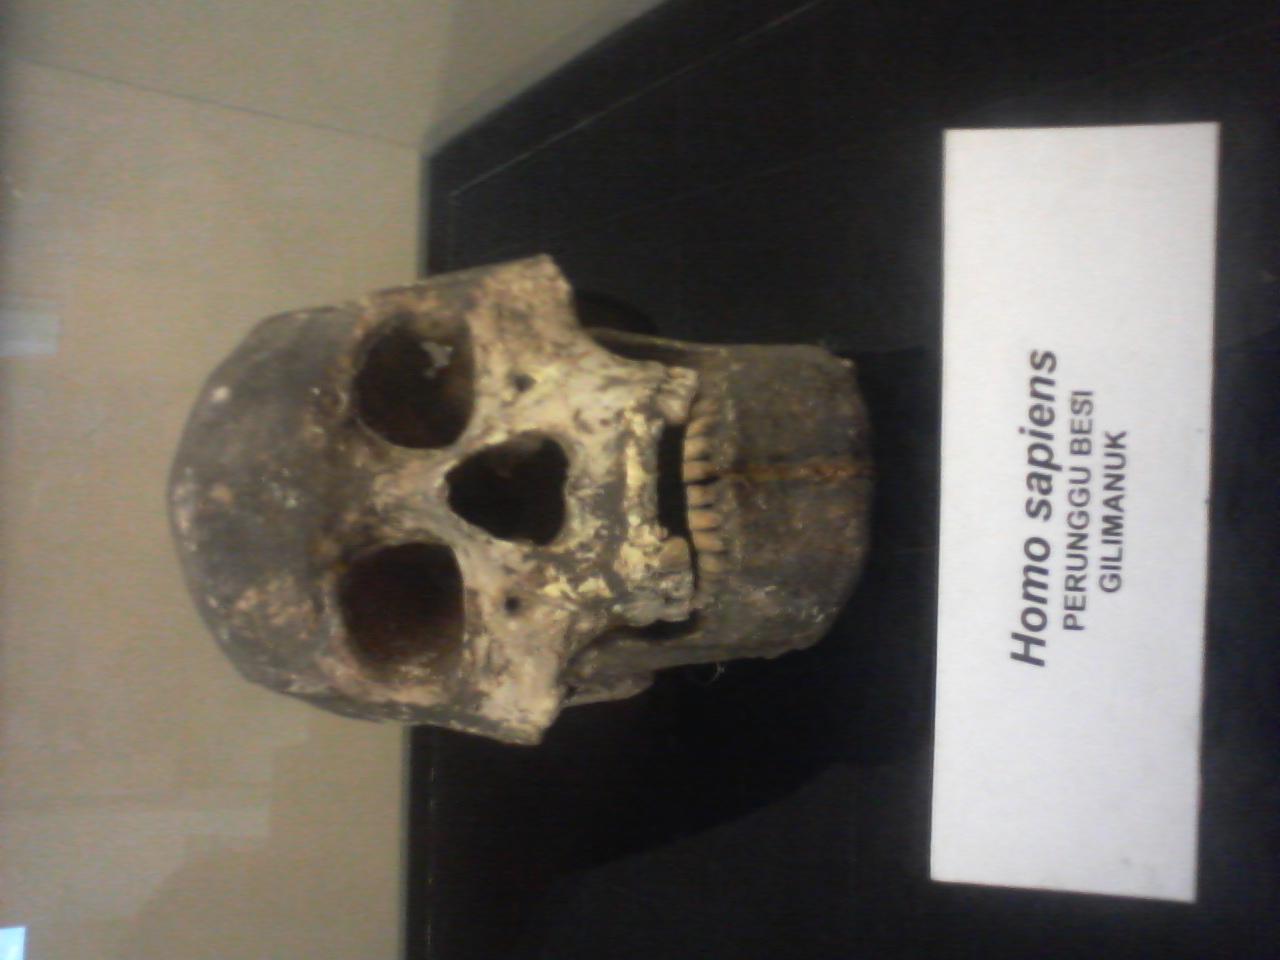 1280 x 960 · 261 kB · jpeg, Fosil Tengkorak Homo sapiens Yang Hidup ...